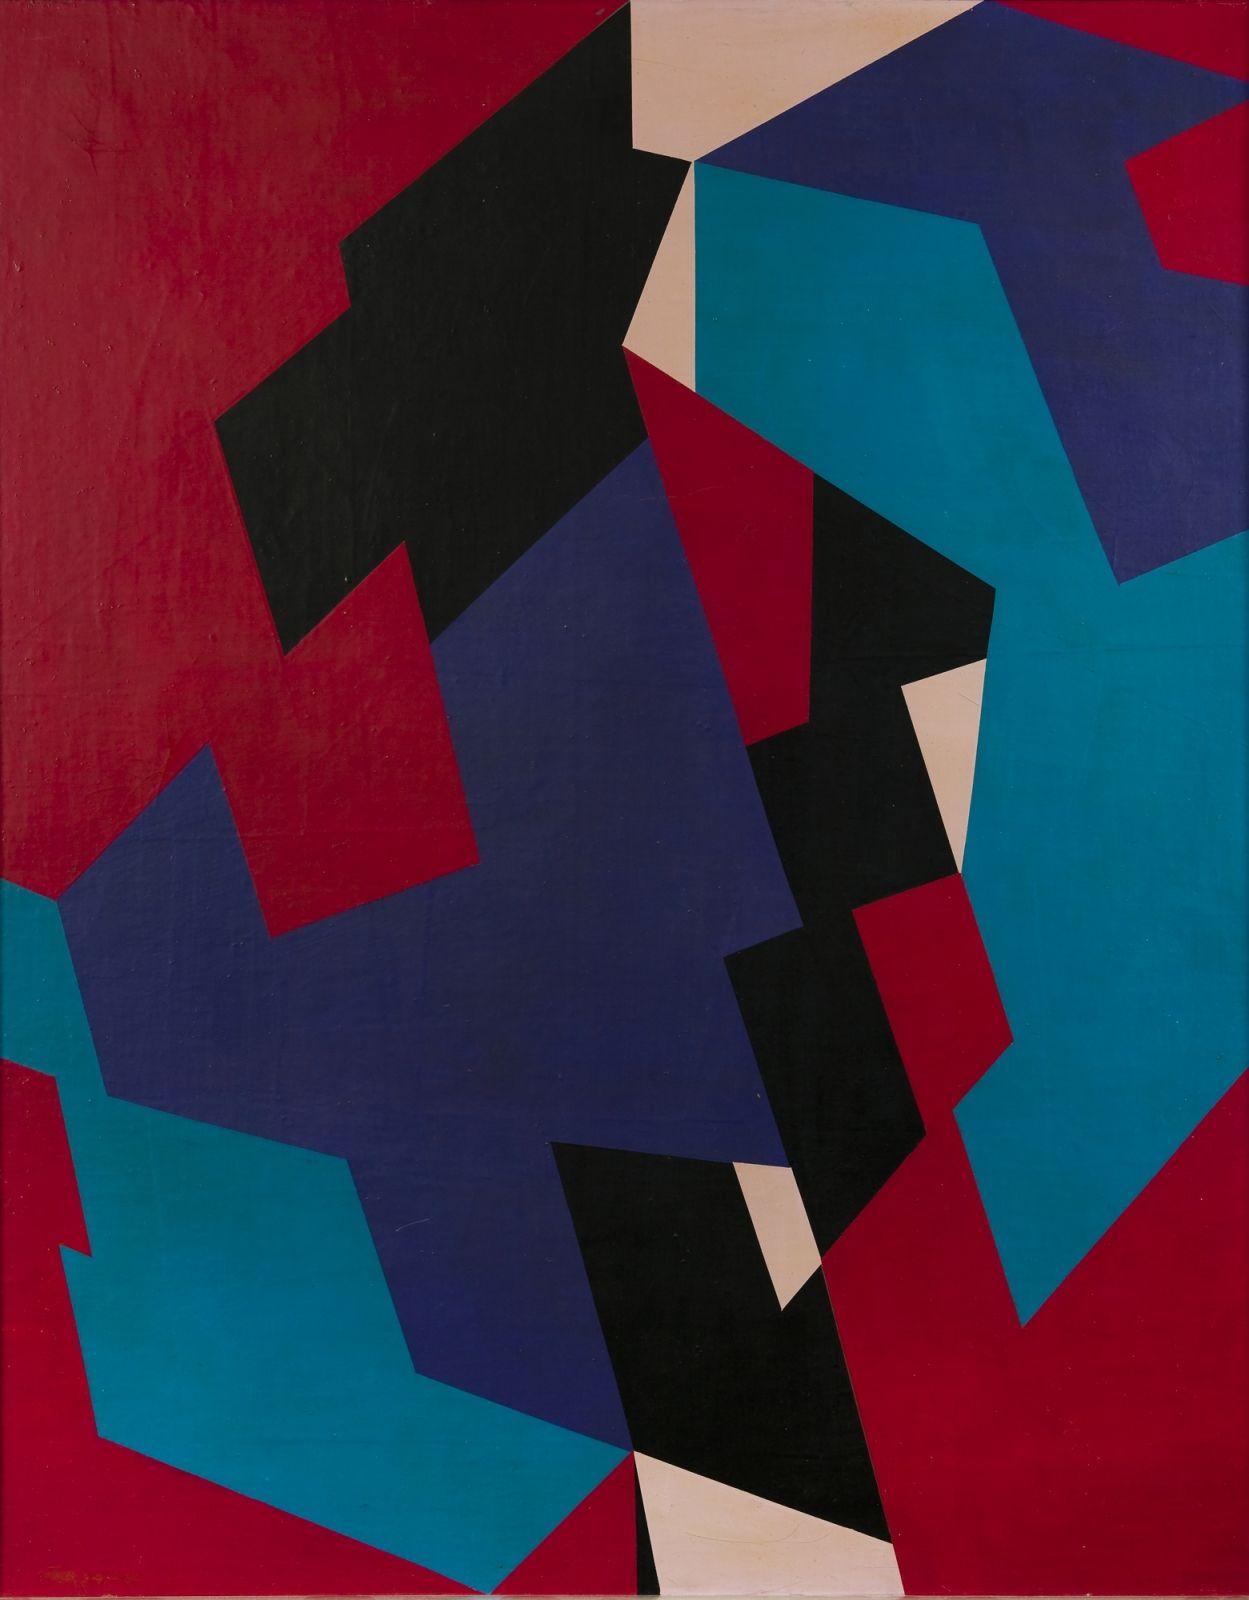 Gunnar S. Gundersen - Composition | Erling Neby Samling | Erling Neby Collection